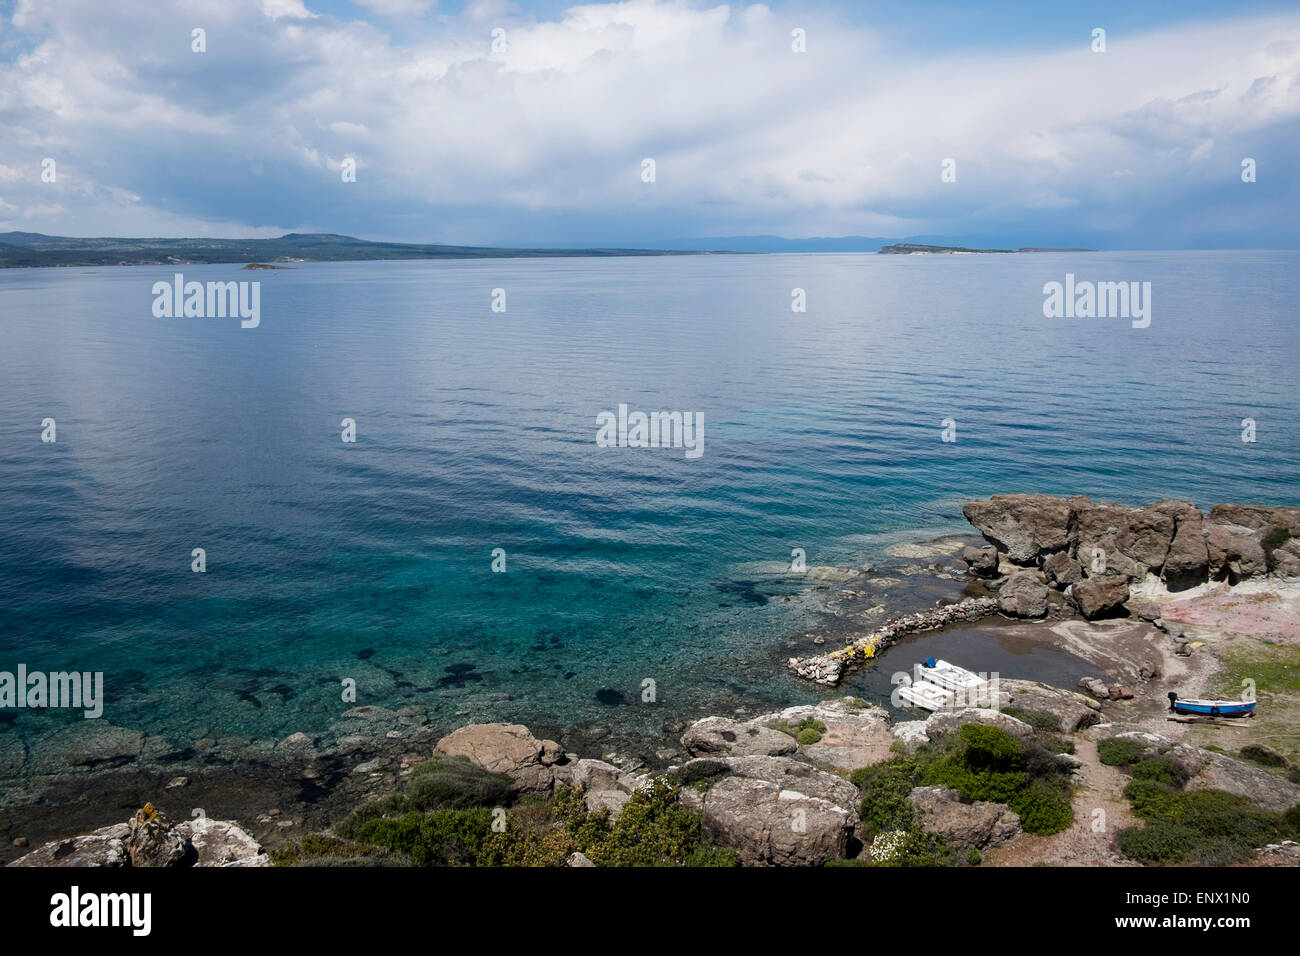 Coast in Lesvos island, Greece. - Stock Image